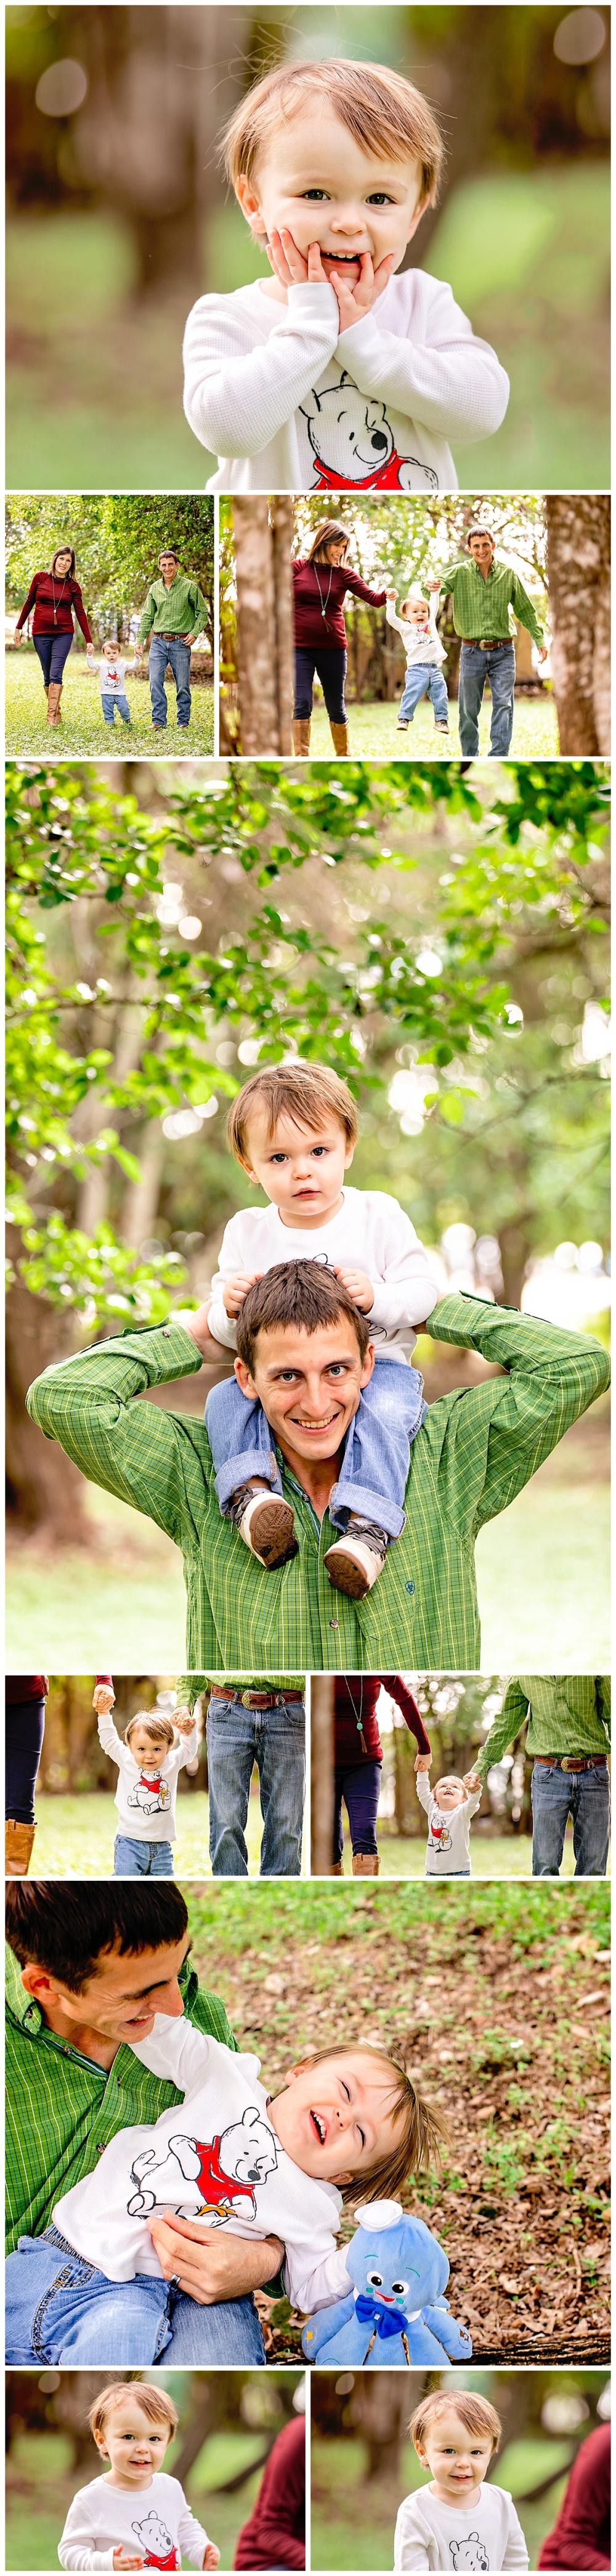 Family-Photographer-Gruene-Texas-Fall-Carly-Barton-Photography_0014.jpg